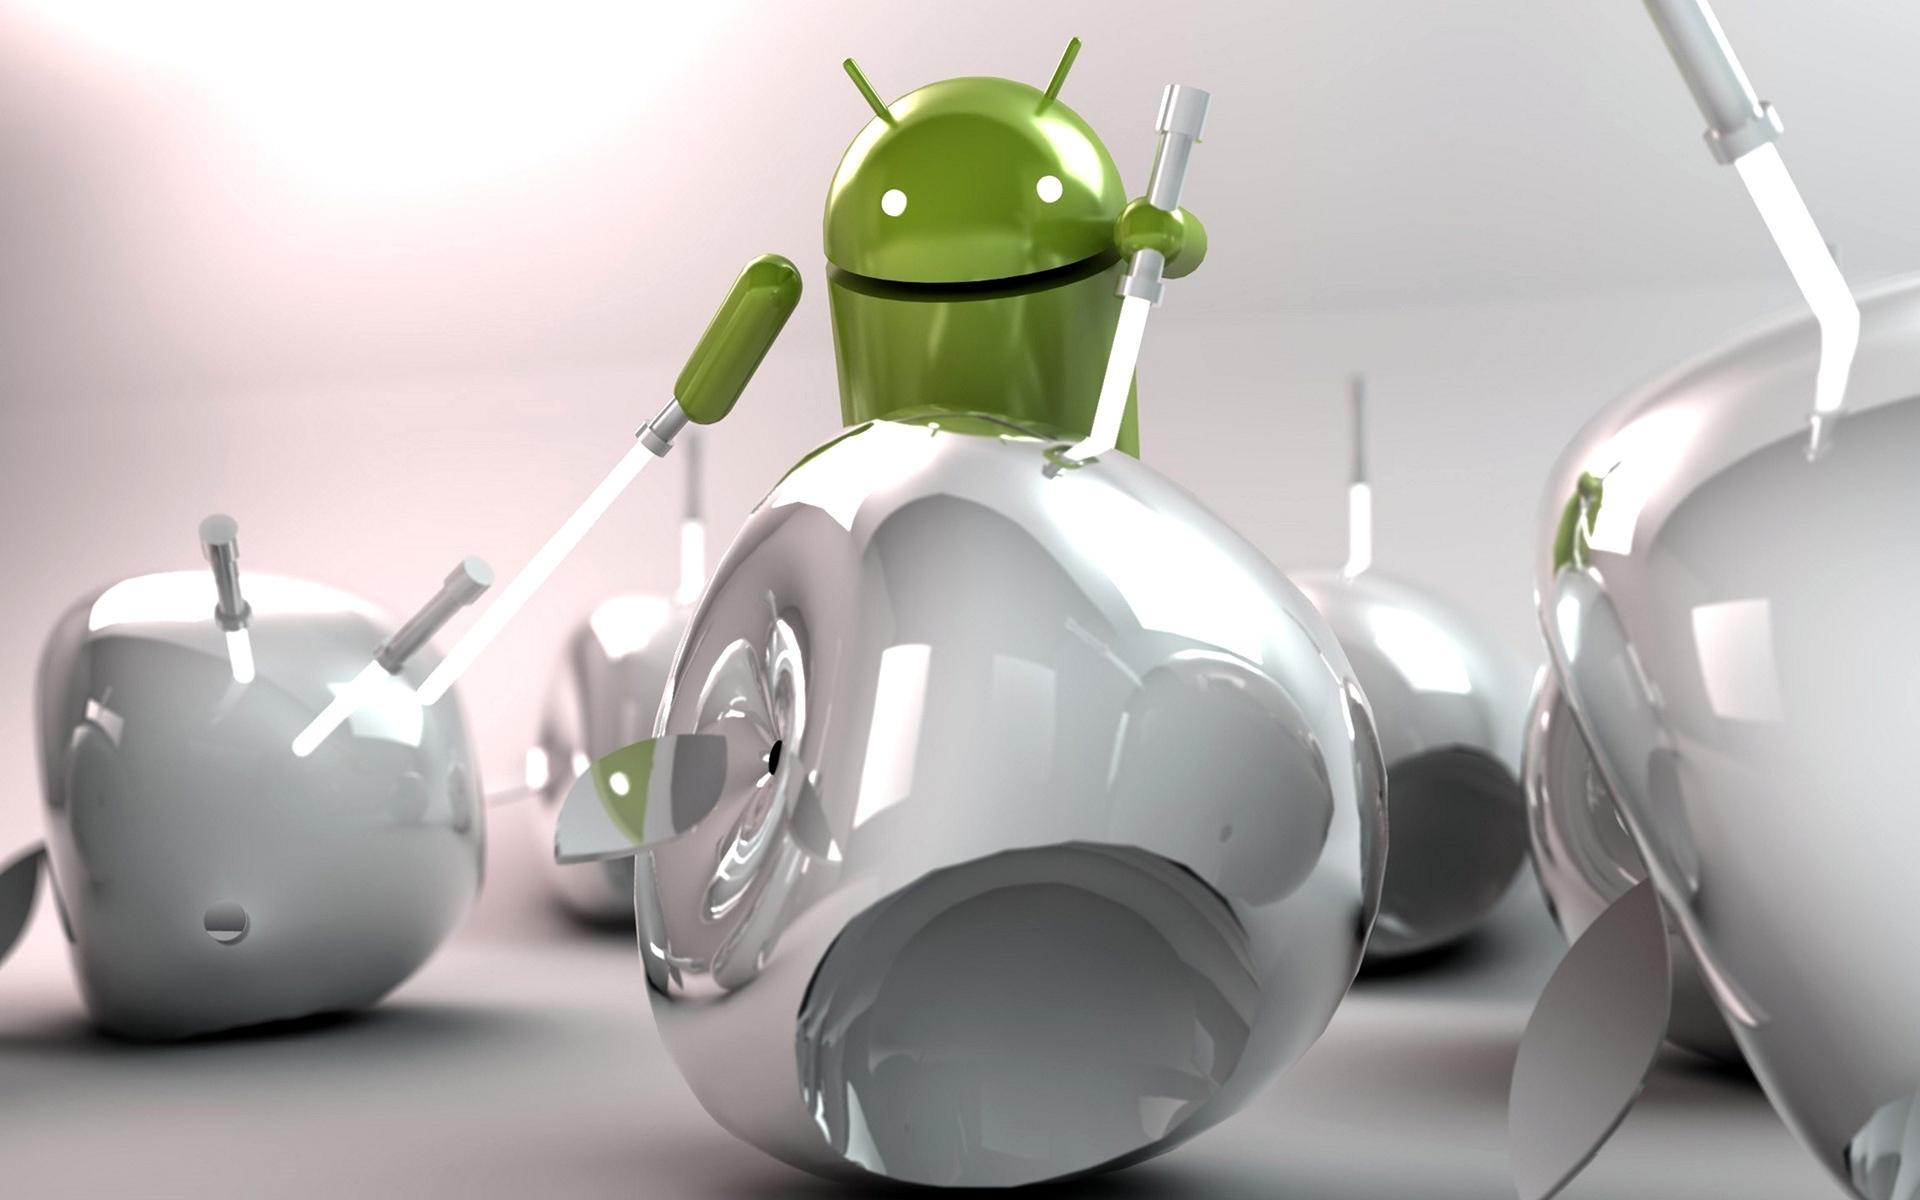 Смешные андроиды картинки